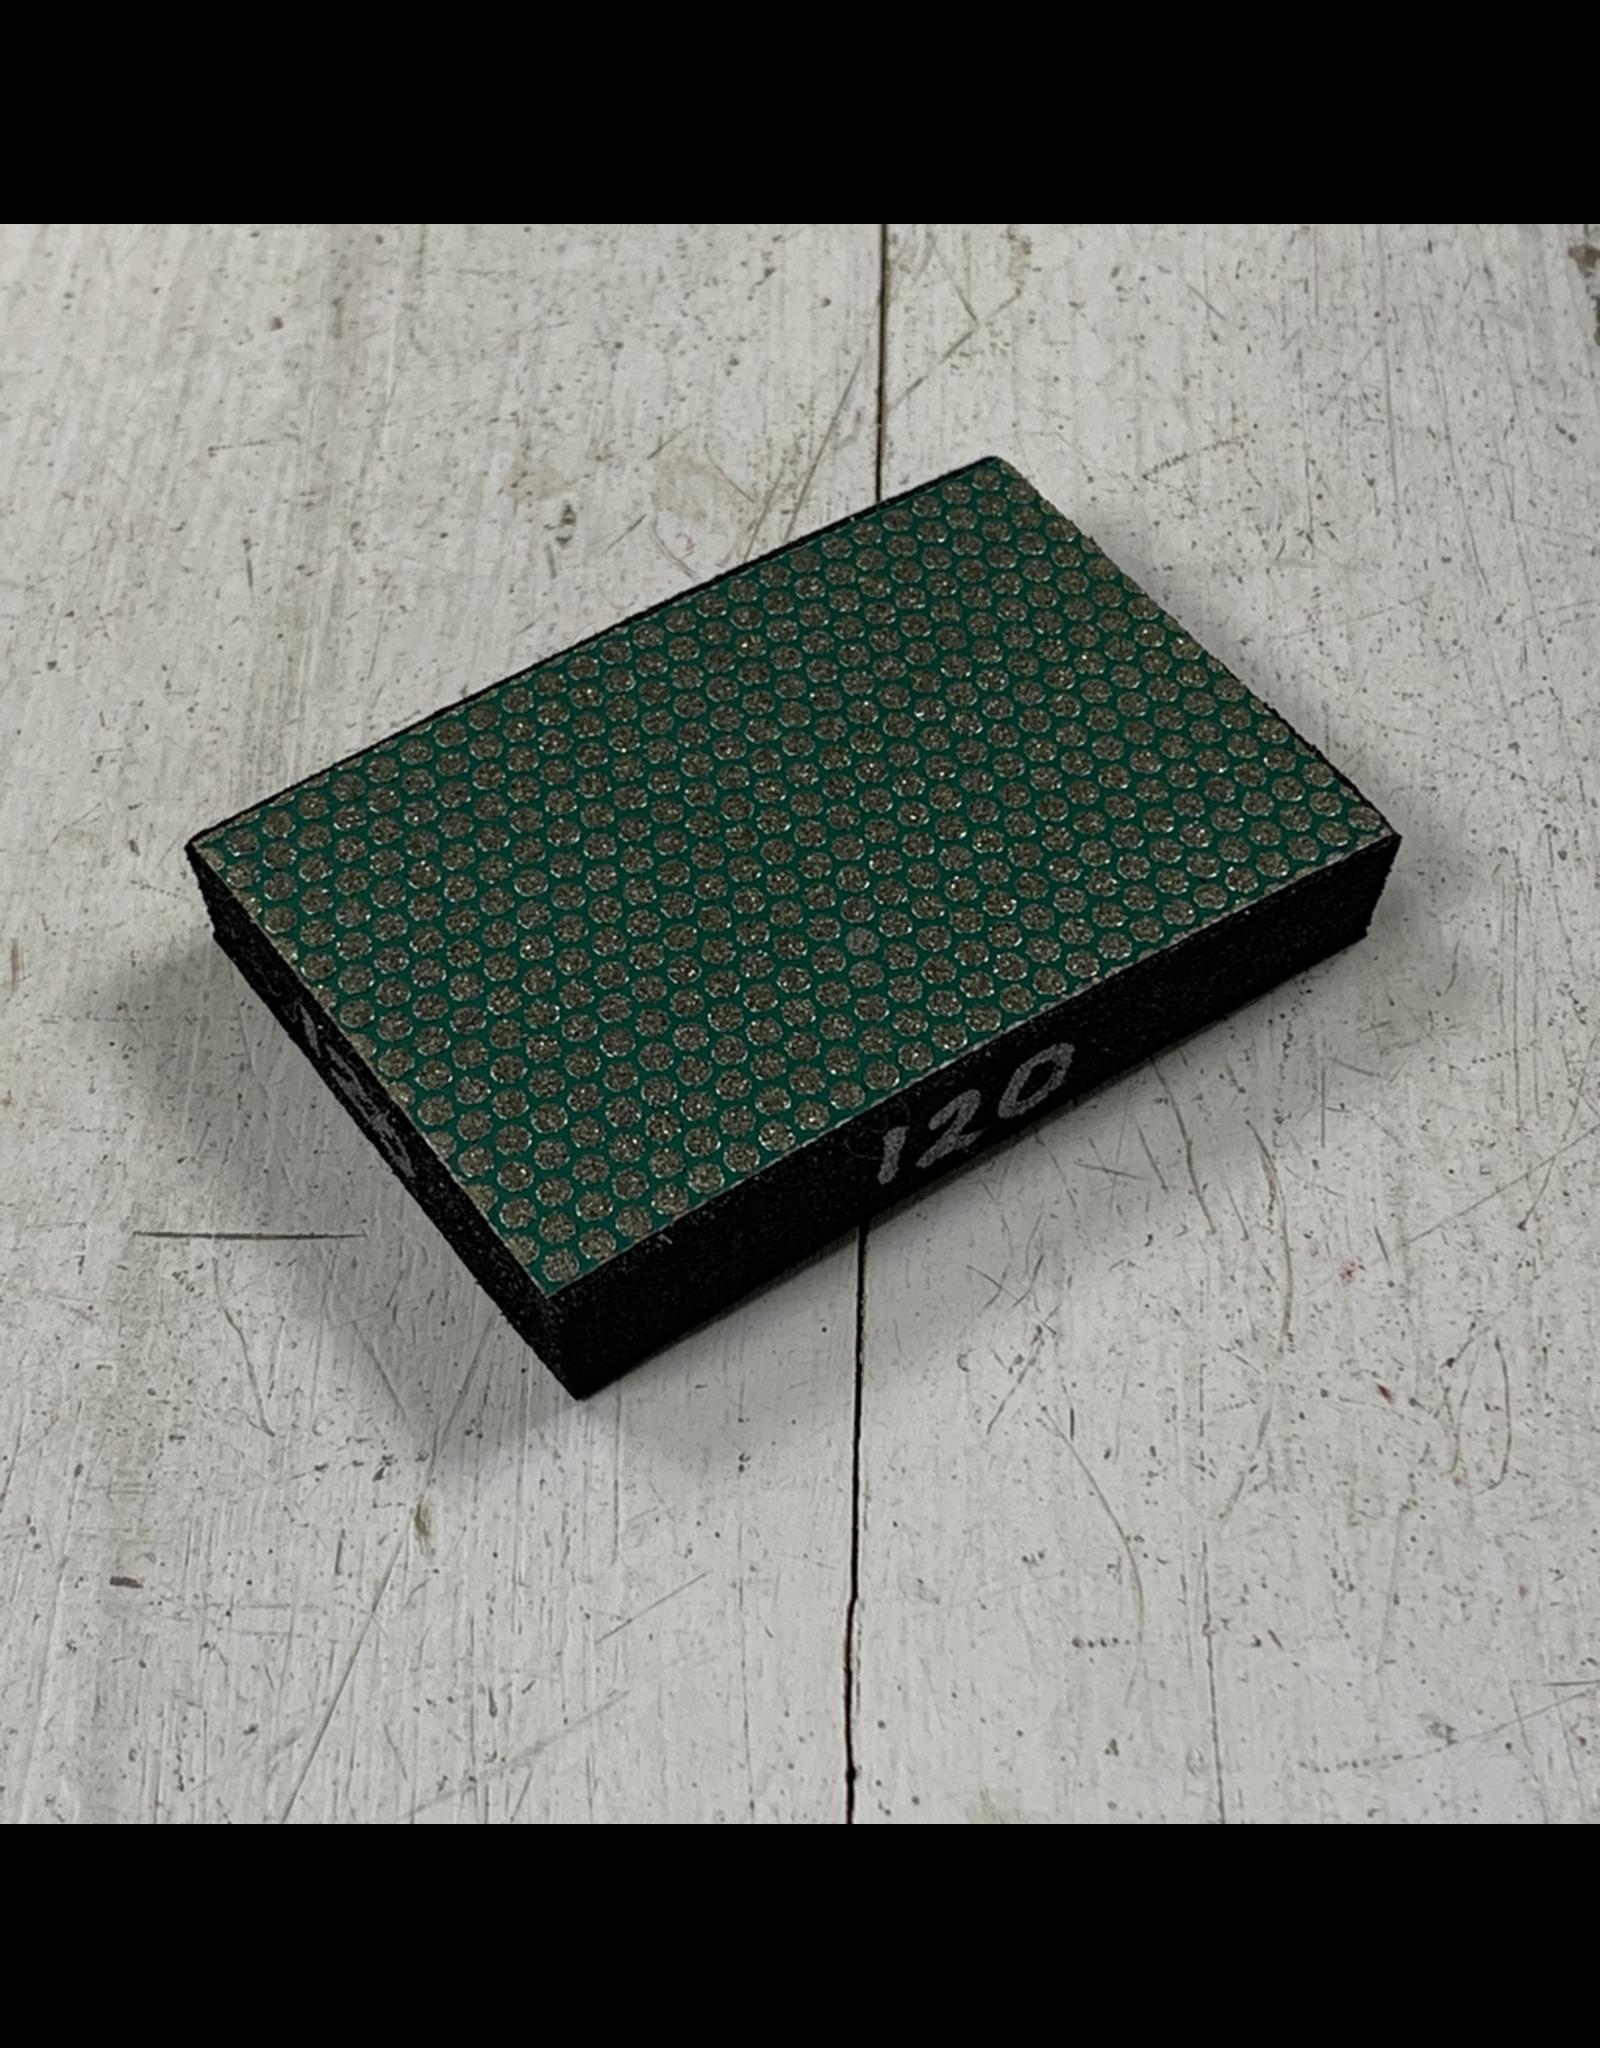 Diamondcore Tools Semi-flex Diamond Pad 120